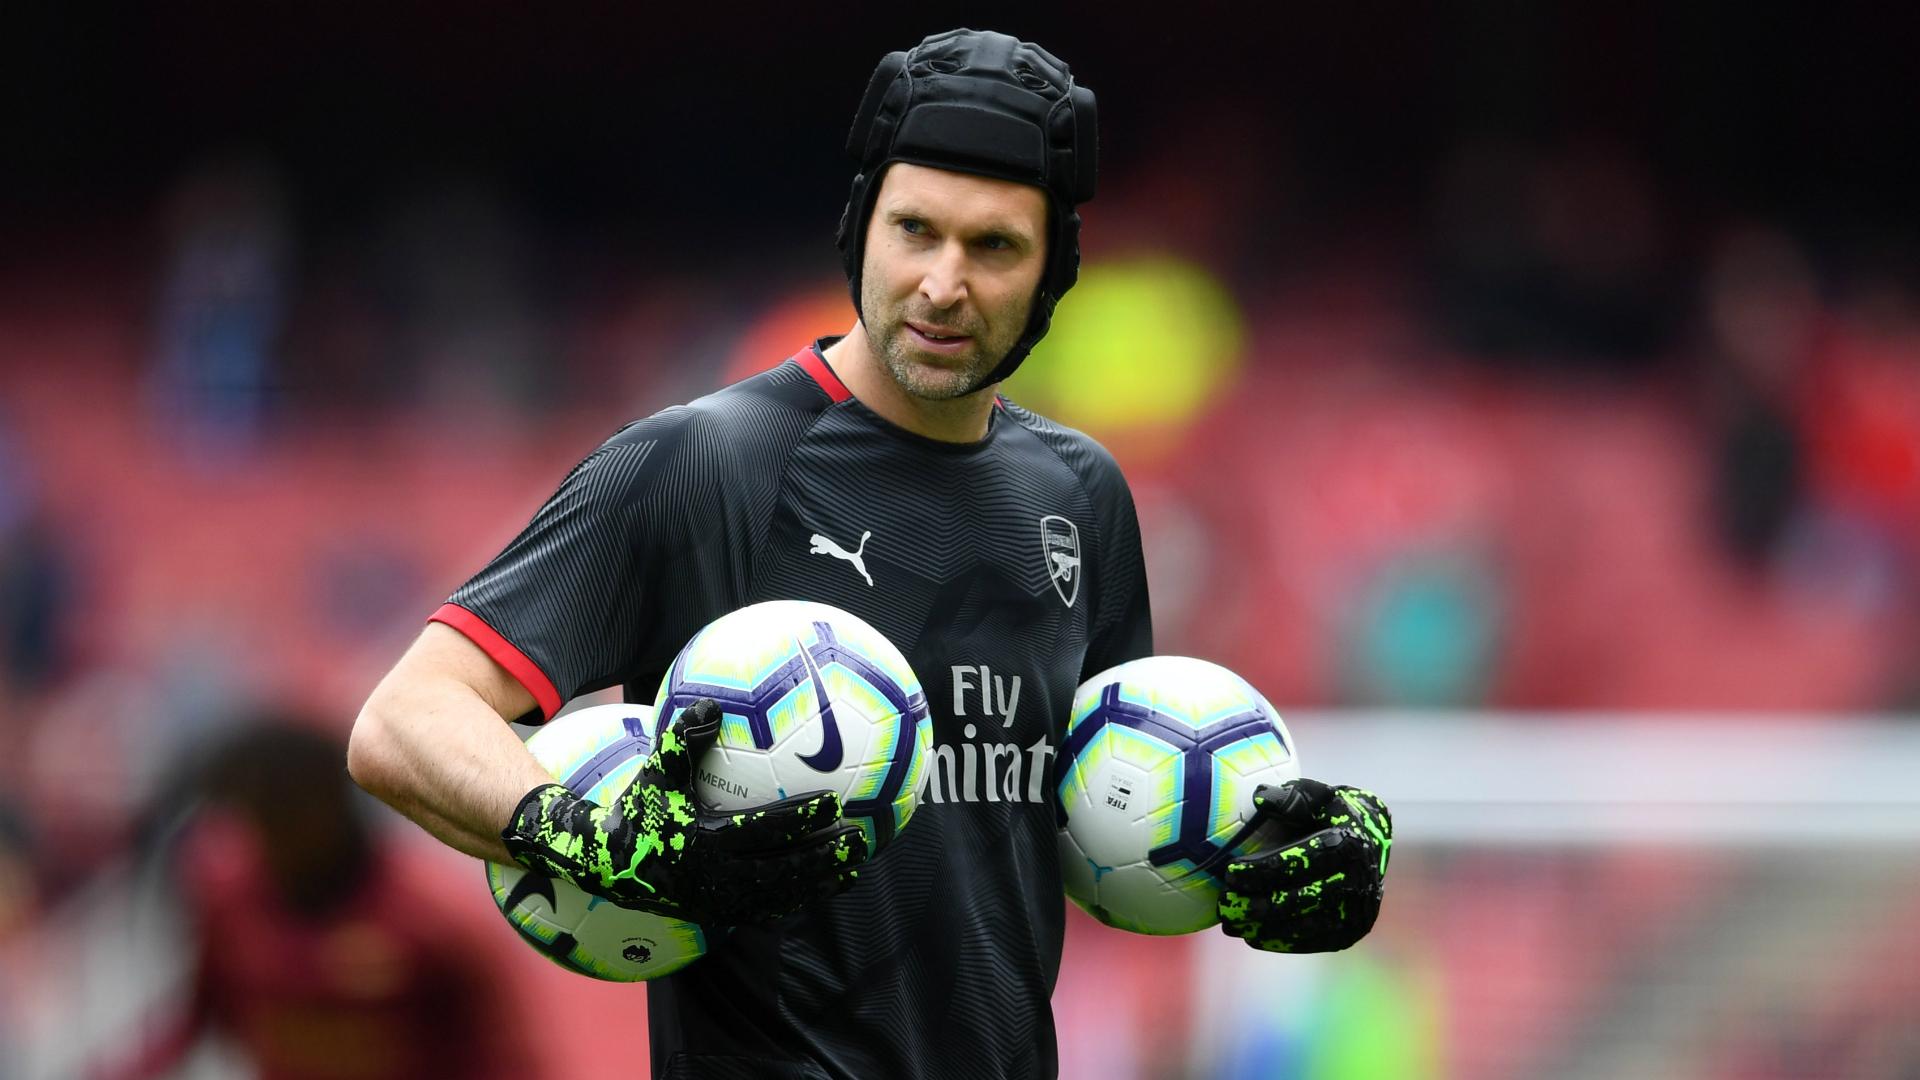 Arsenal News: Petr Cech Confirms He Will Retire After